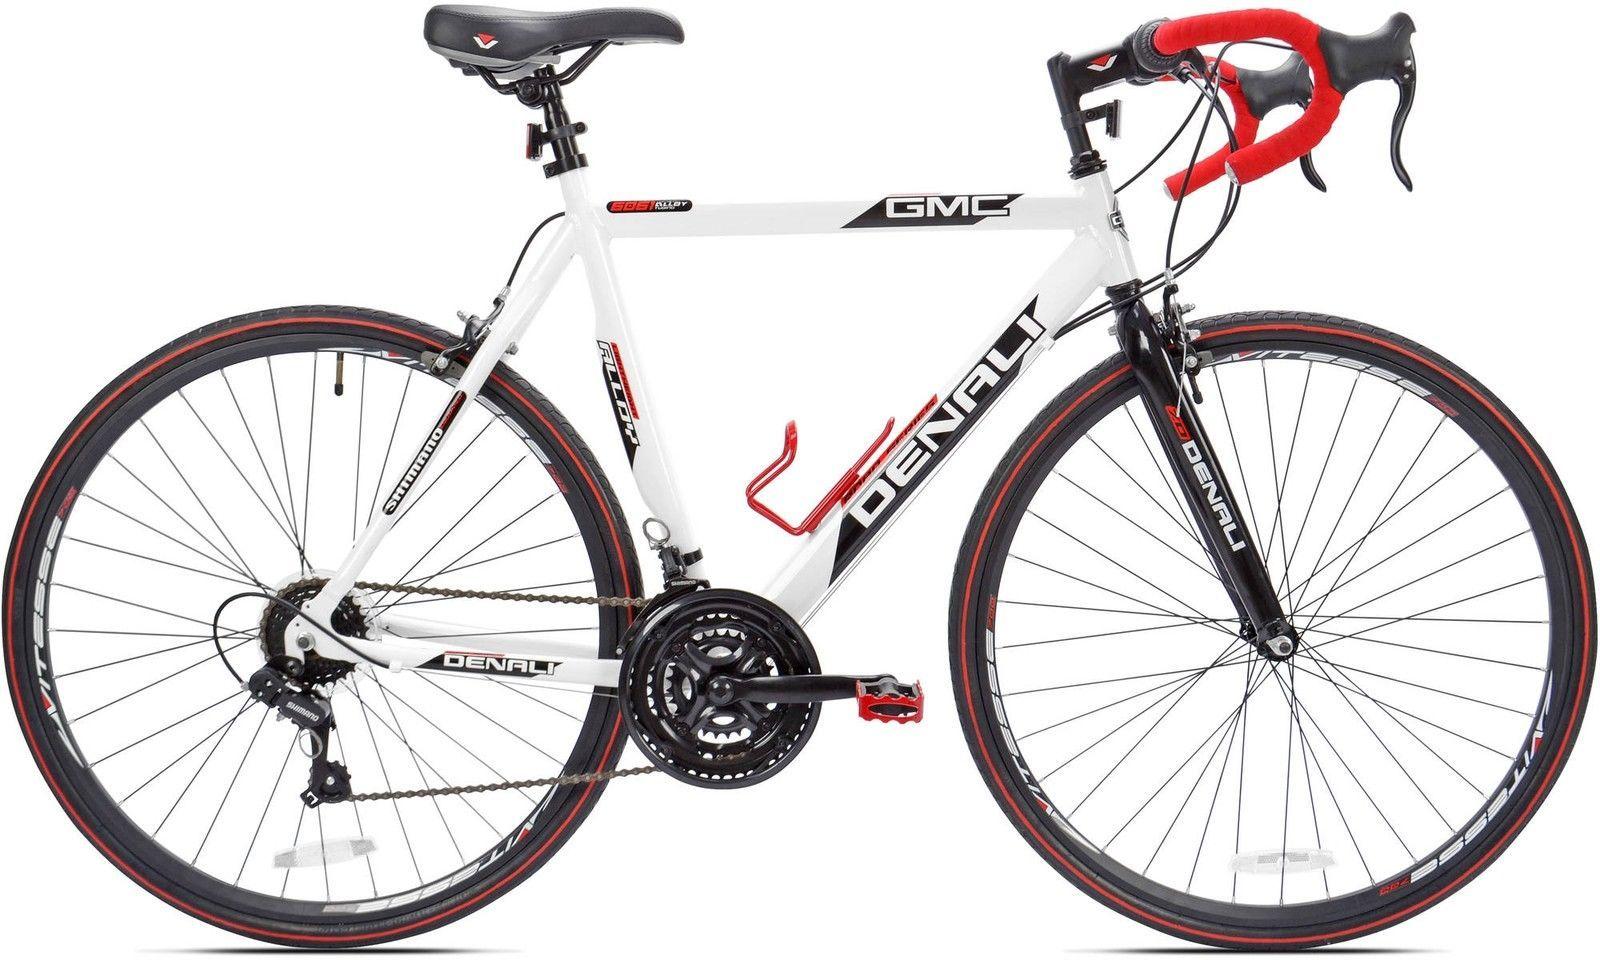 New Gmc Denali Road Bike 21 Speed 22 5 Aluminum Frame Men Bicycle